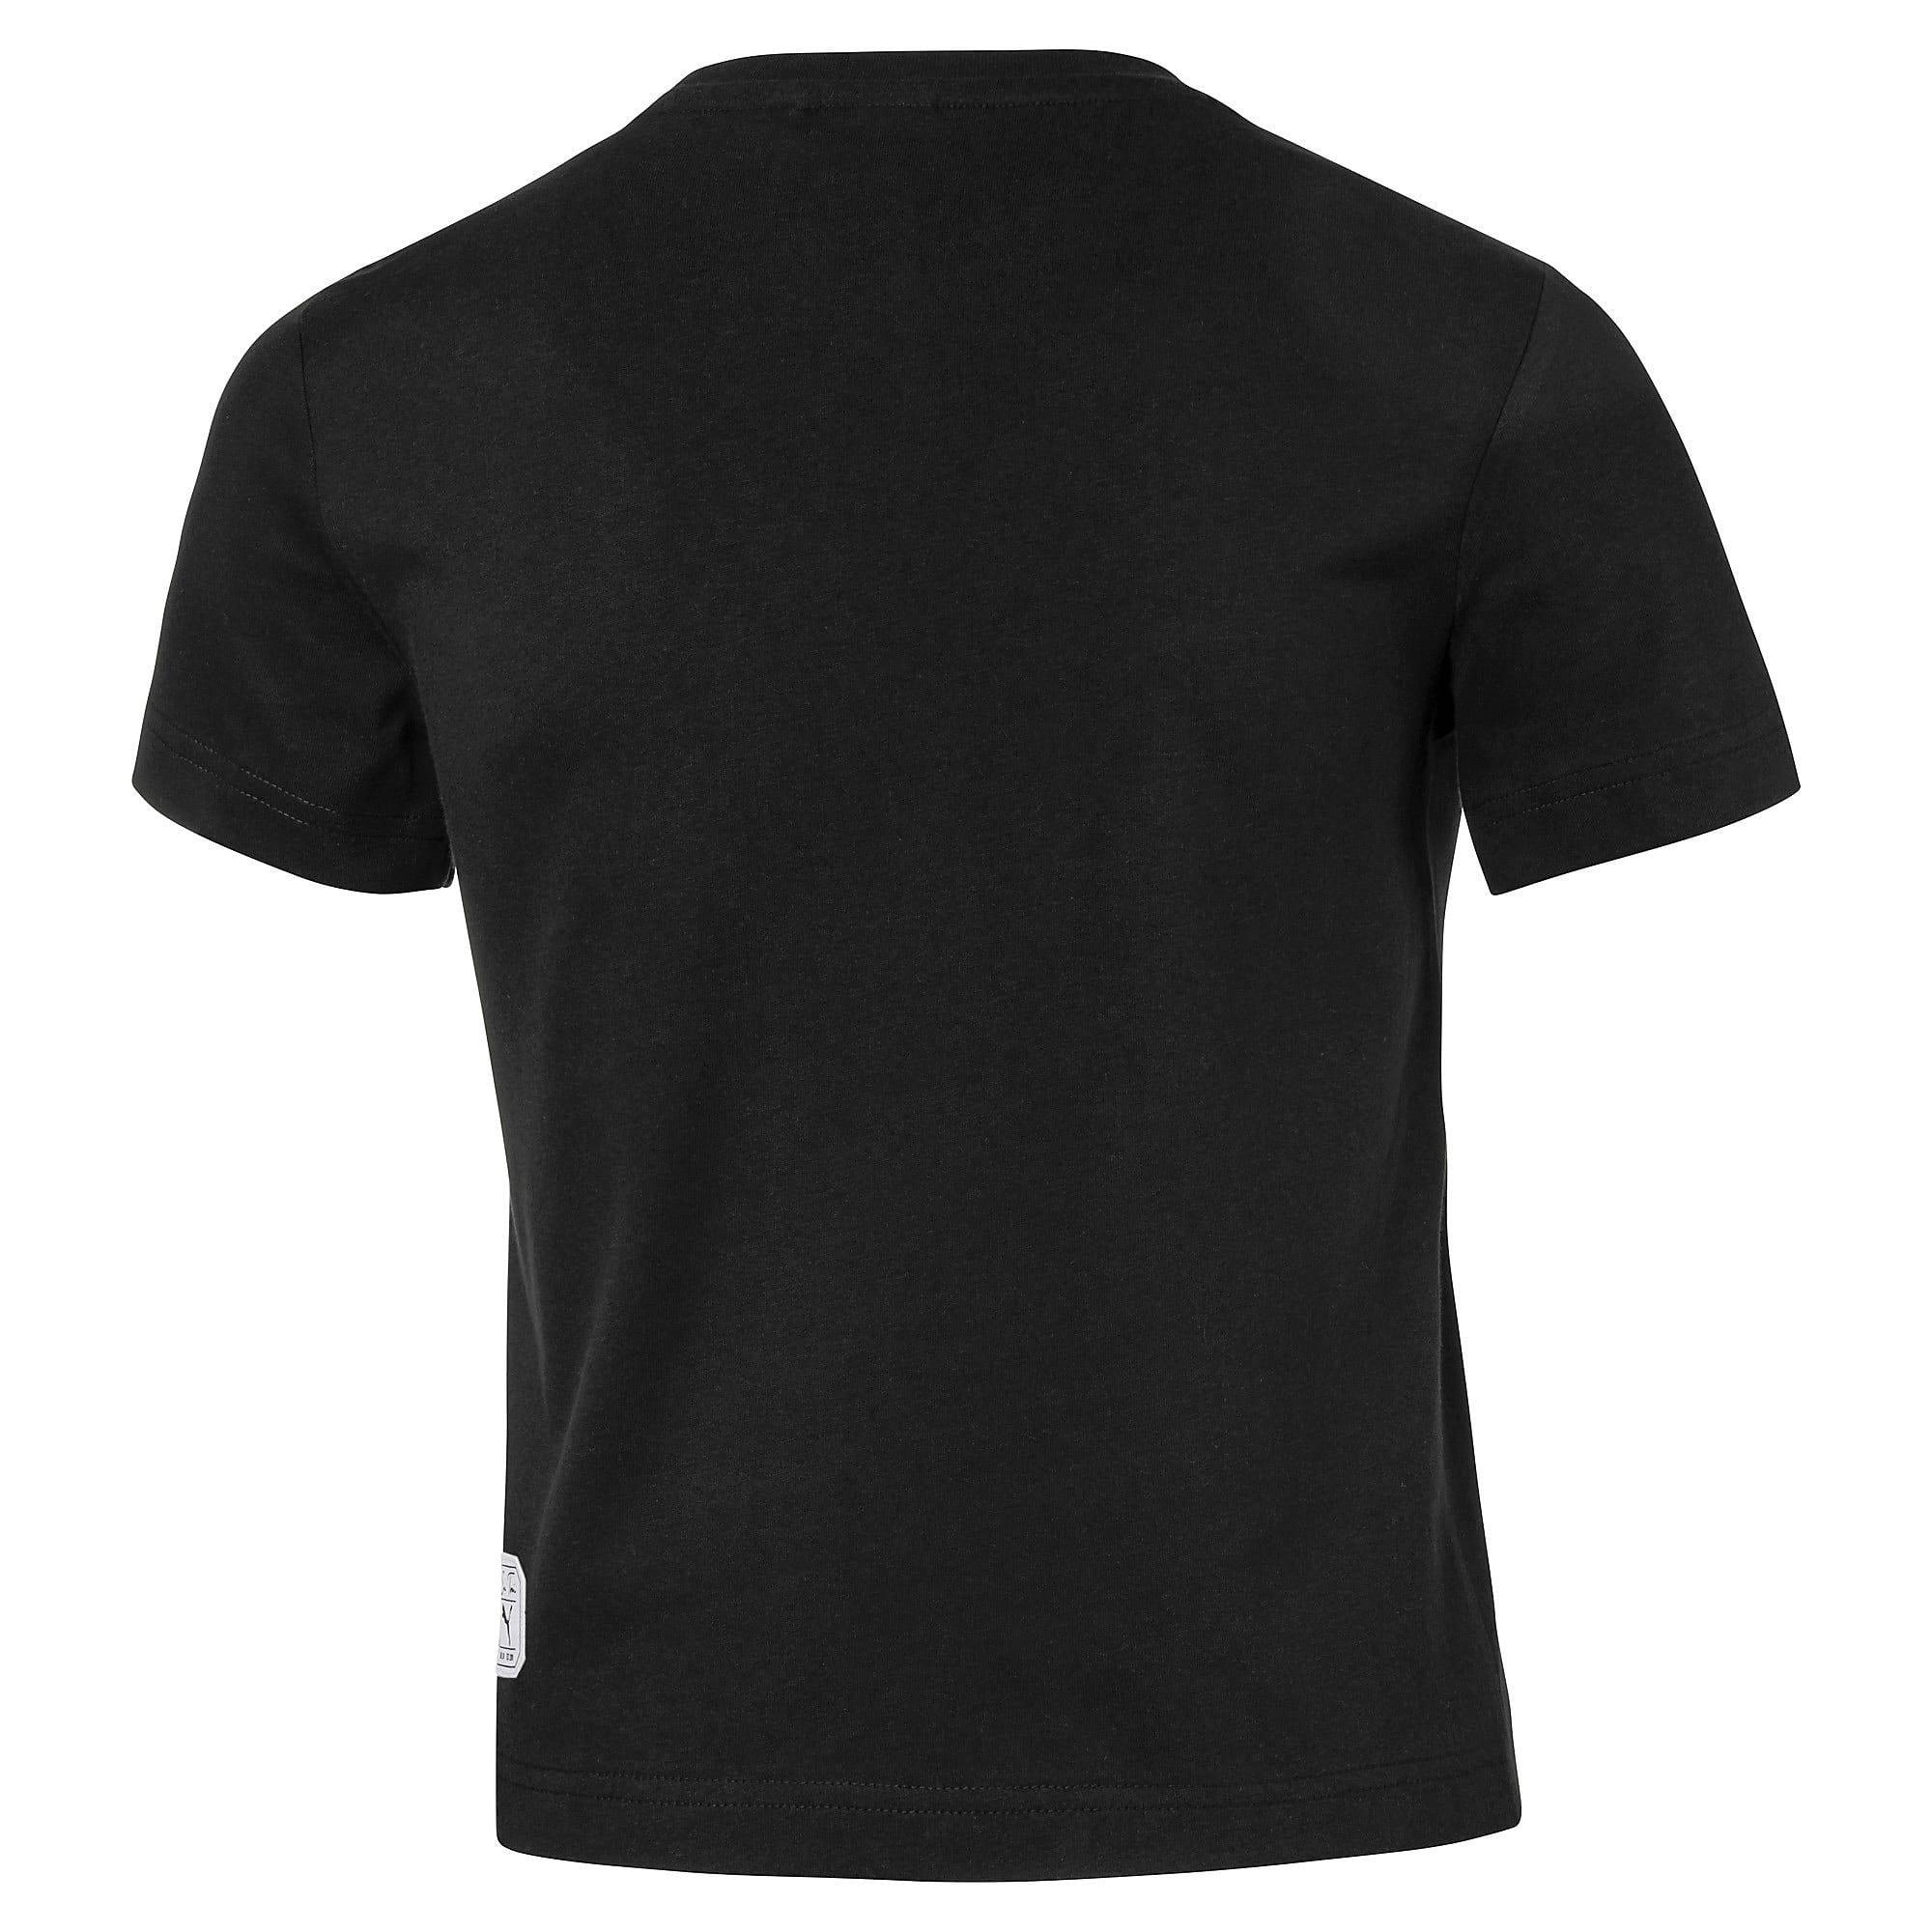 Thumbnail 3 of PUMA x SUE TSAI ウィメンズ Tシャツ, Puma Black, medium-JPN